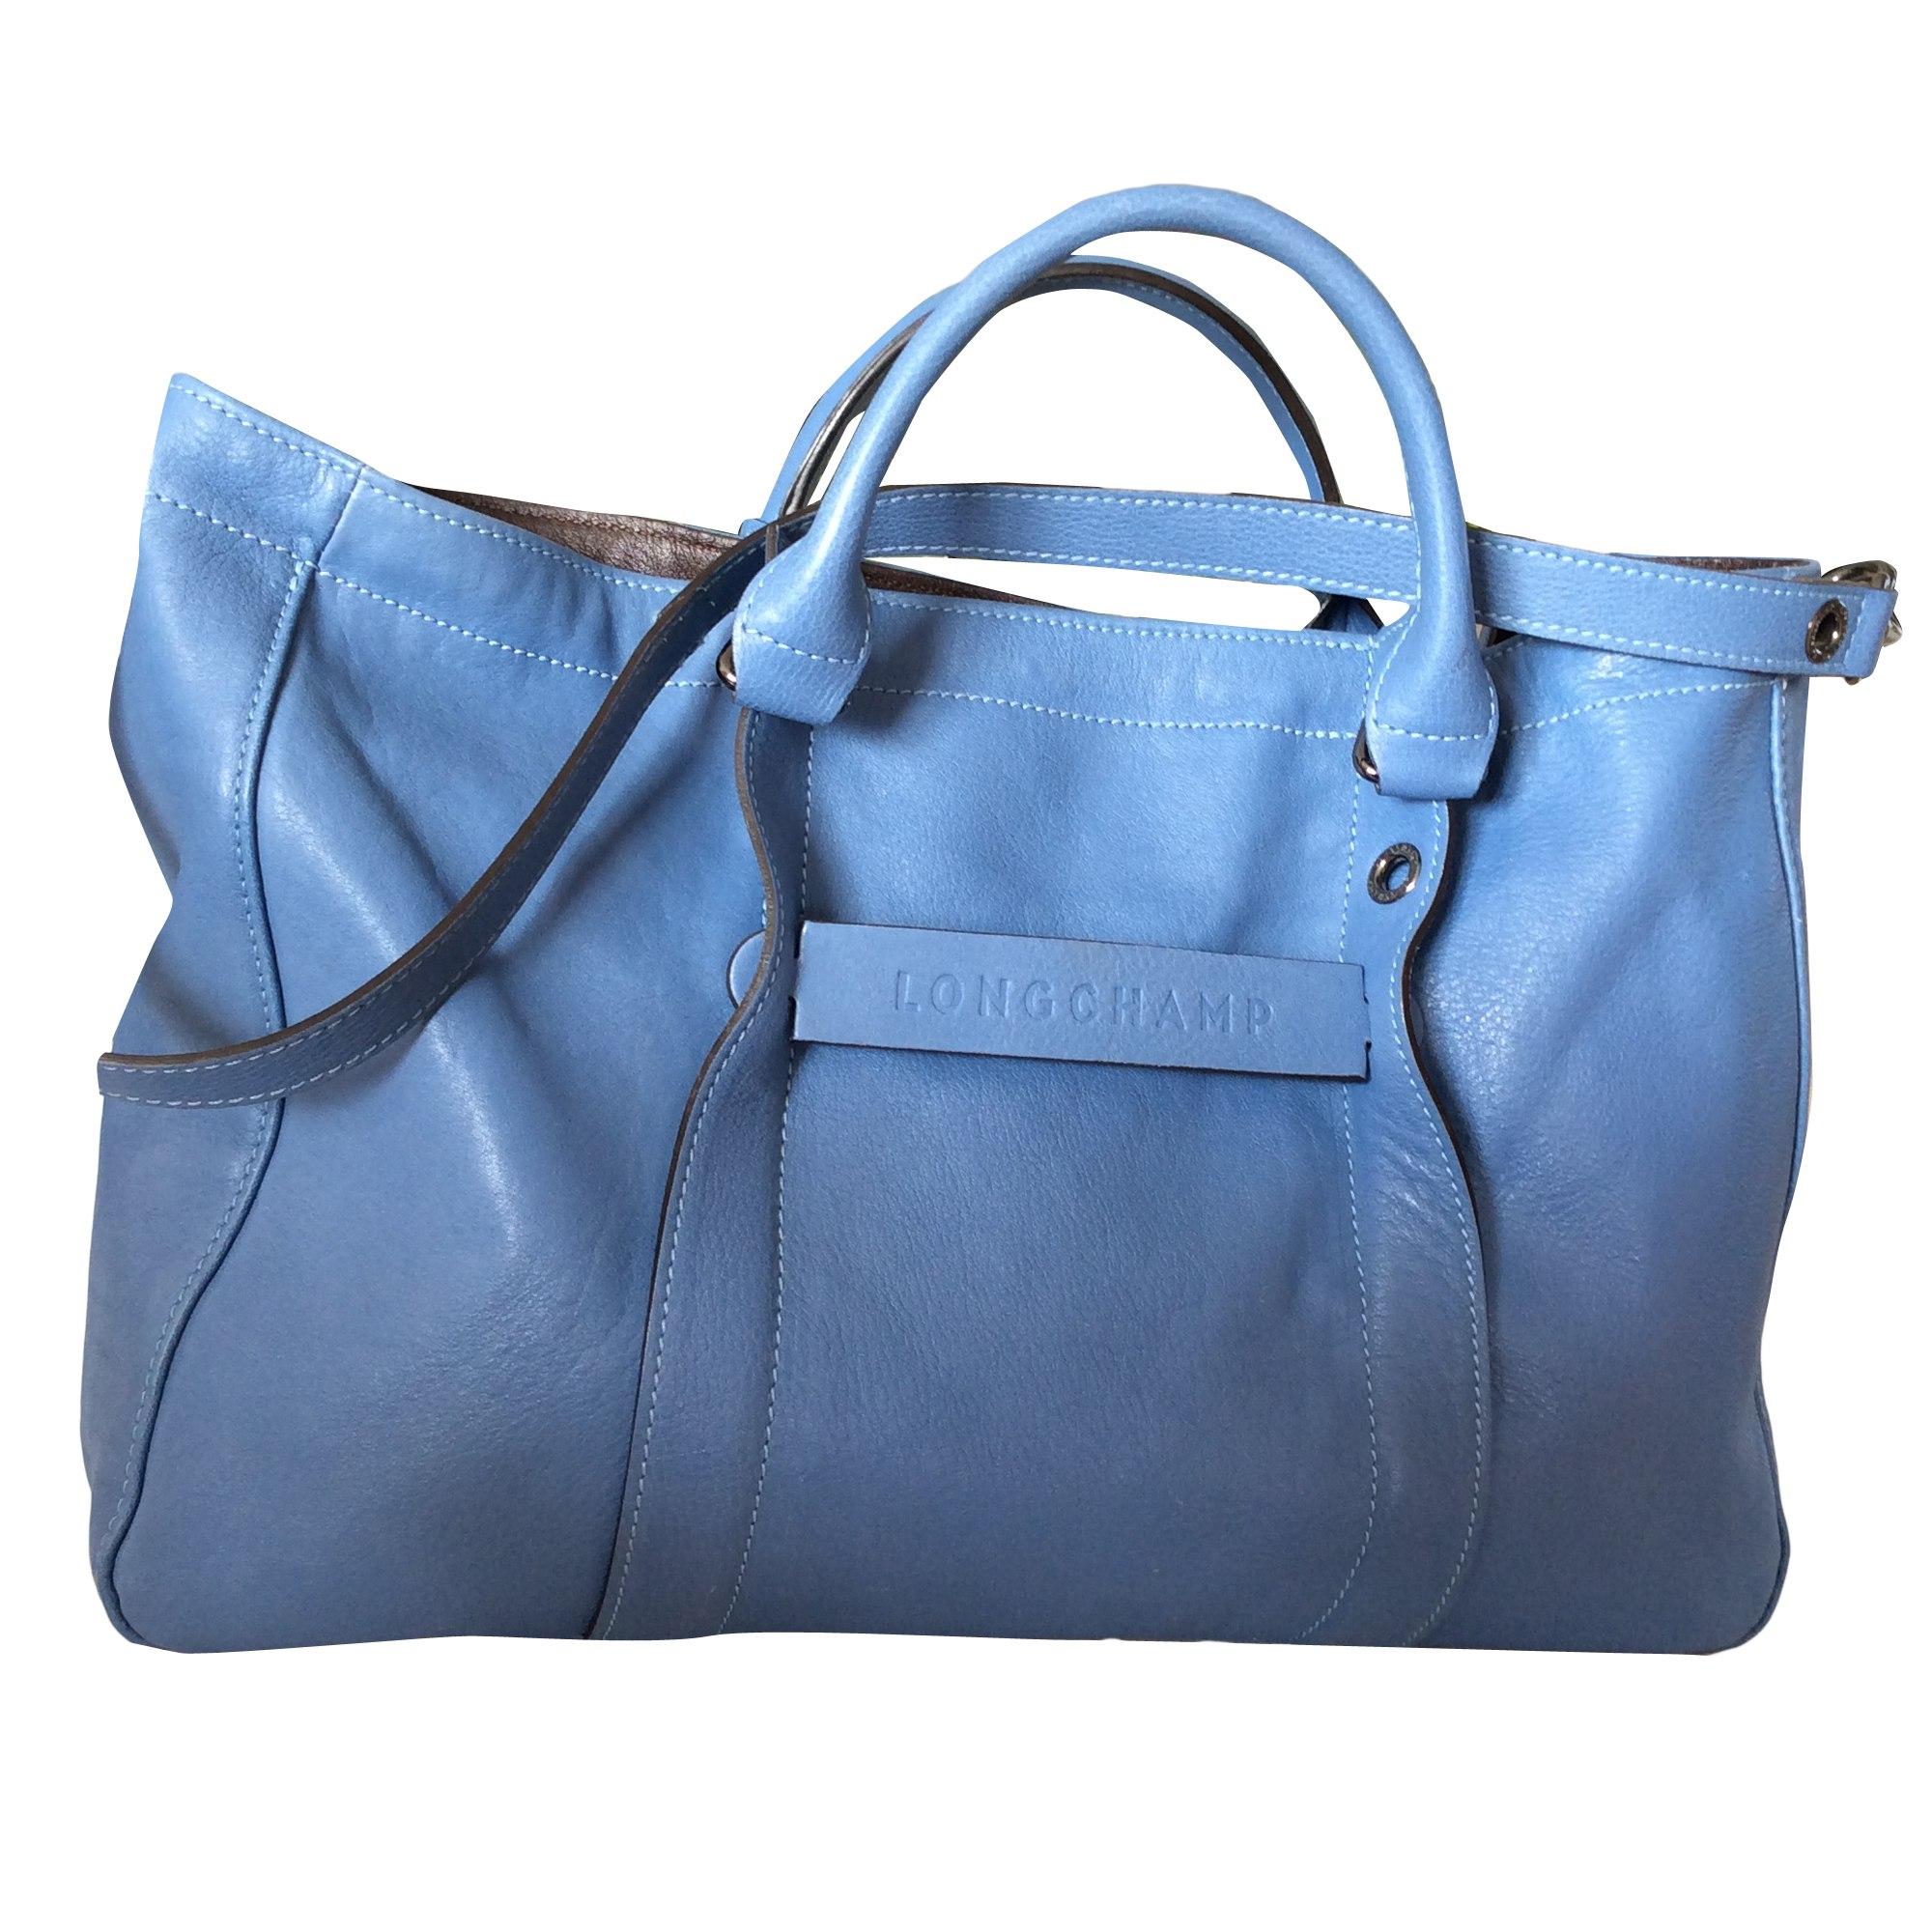 Main Bleu À Longchamp Cuir En Marine Sac Turquoise Bleu nSZ7RZ